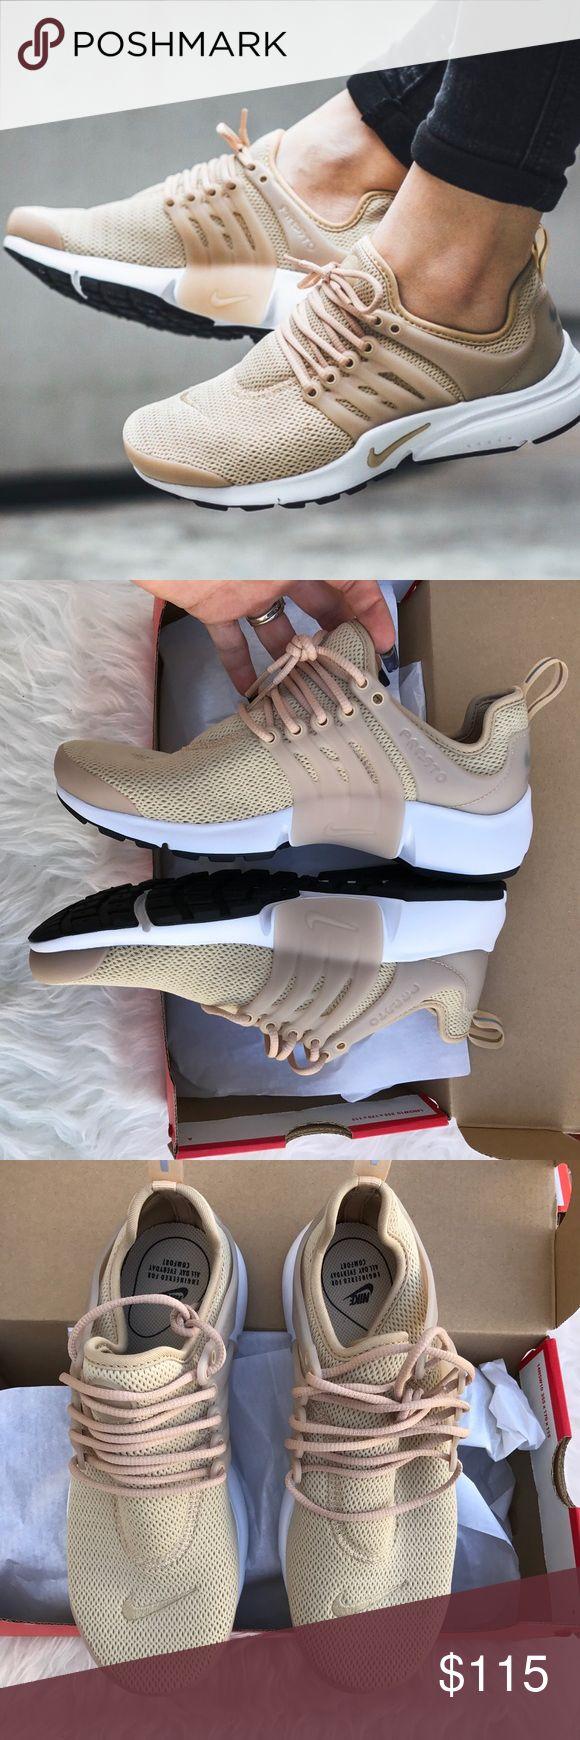 NIKE AIR PRESTO LINEN LIMITED EDITION COLOR Sz 9 NIKE AIR PRESTO LINEN COLOR SOLD OUT Sz 9 new 100% authentic! Itemcloset#seize Nike Shoes